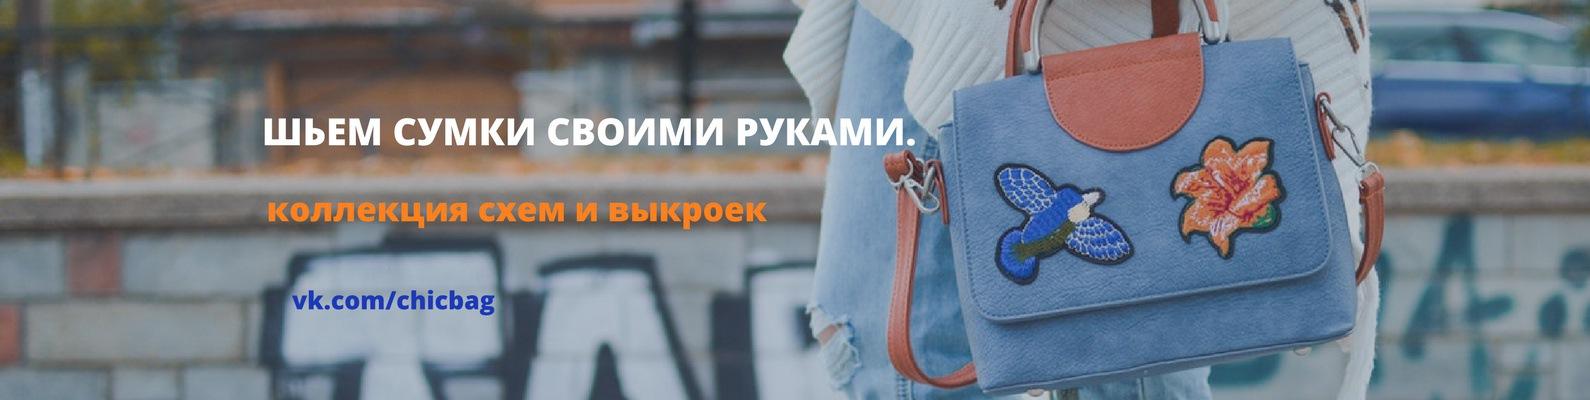 4ddd452b Шьем сумки своими руками. Схемы. Выкройки. | ВКонтакте